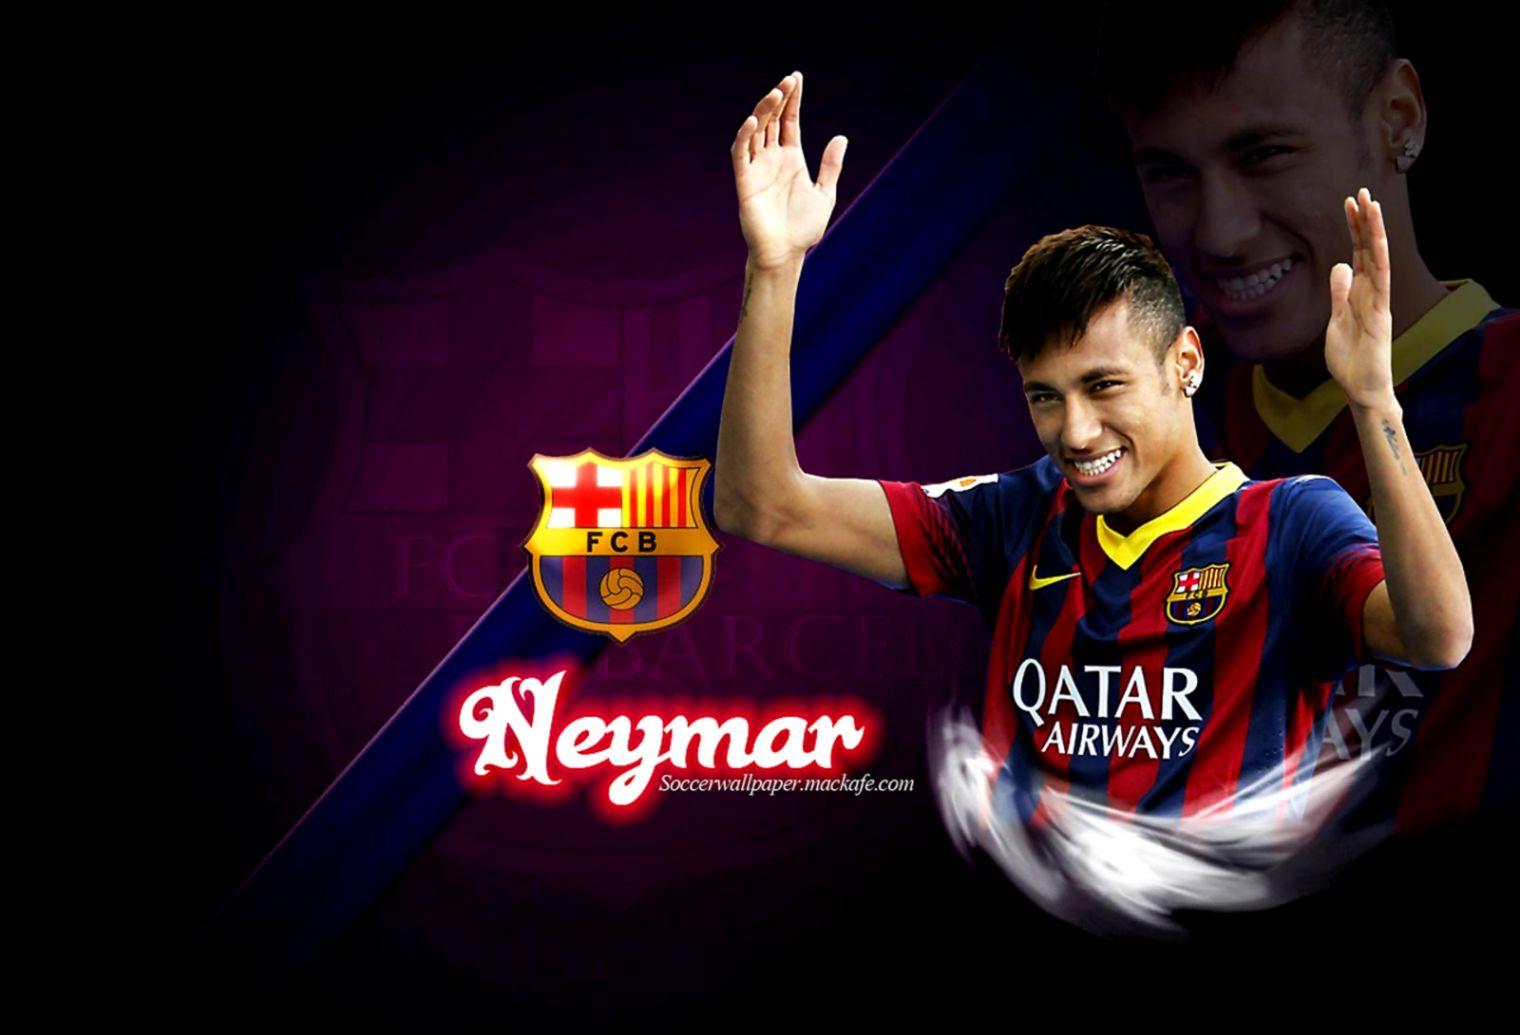 barcelona neymar 2013 hd wallpaper all wallpapers desktop